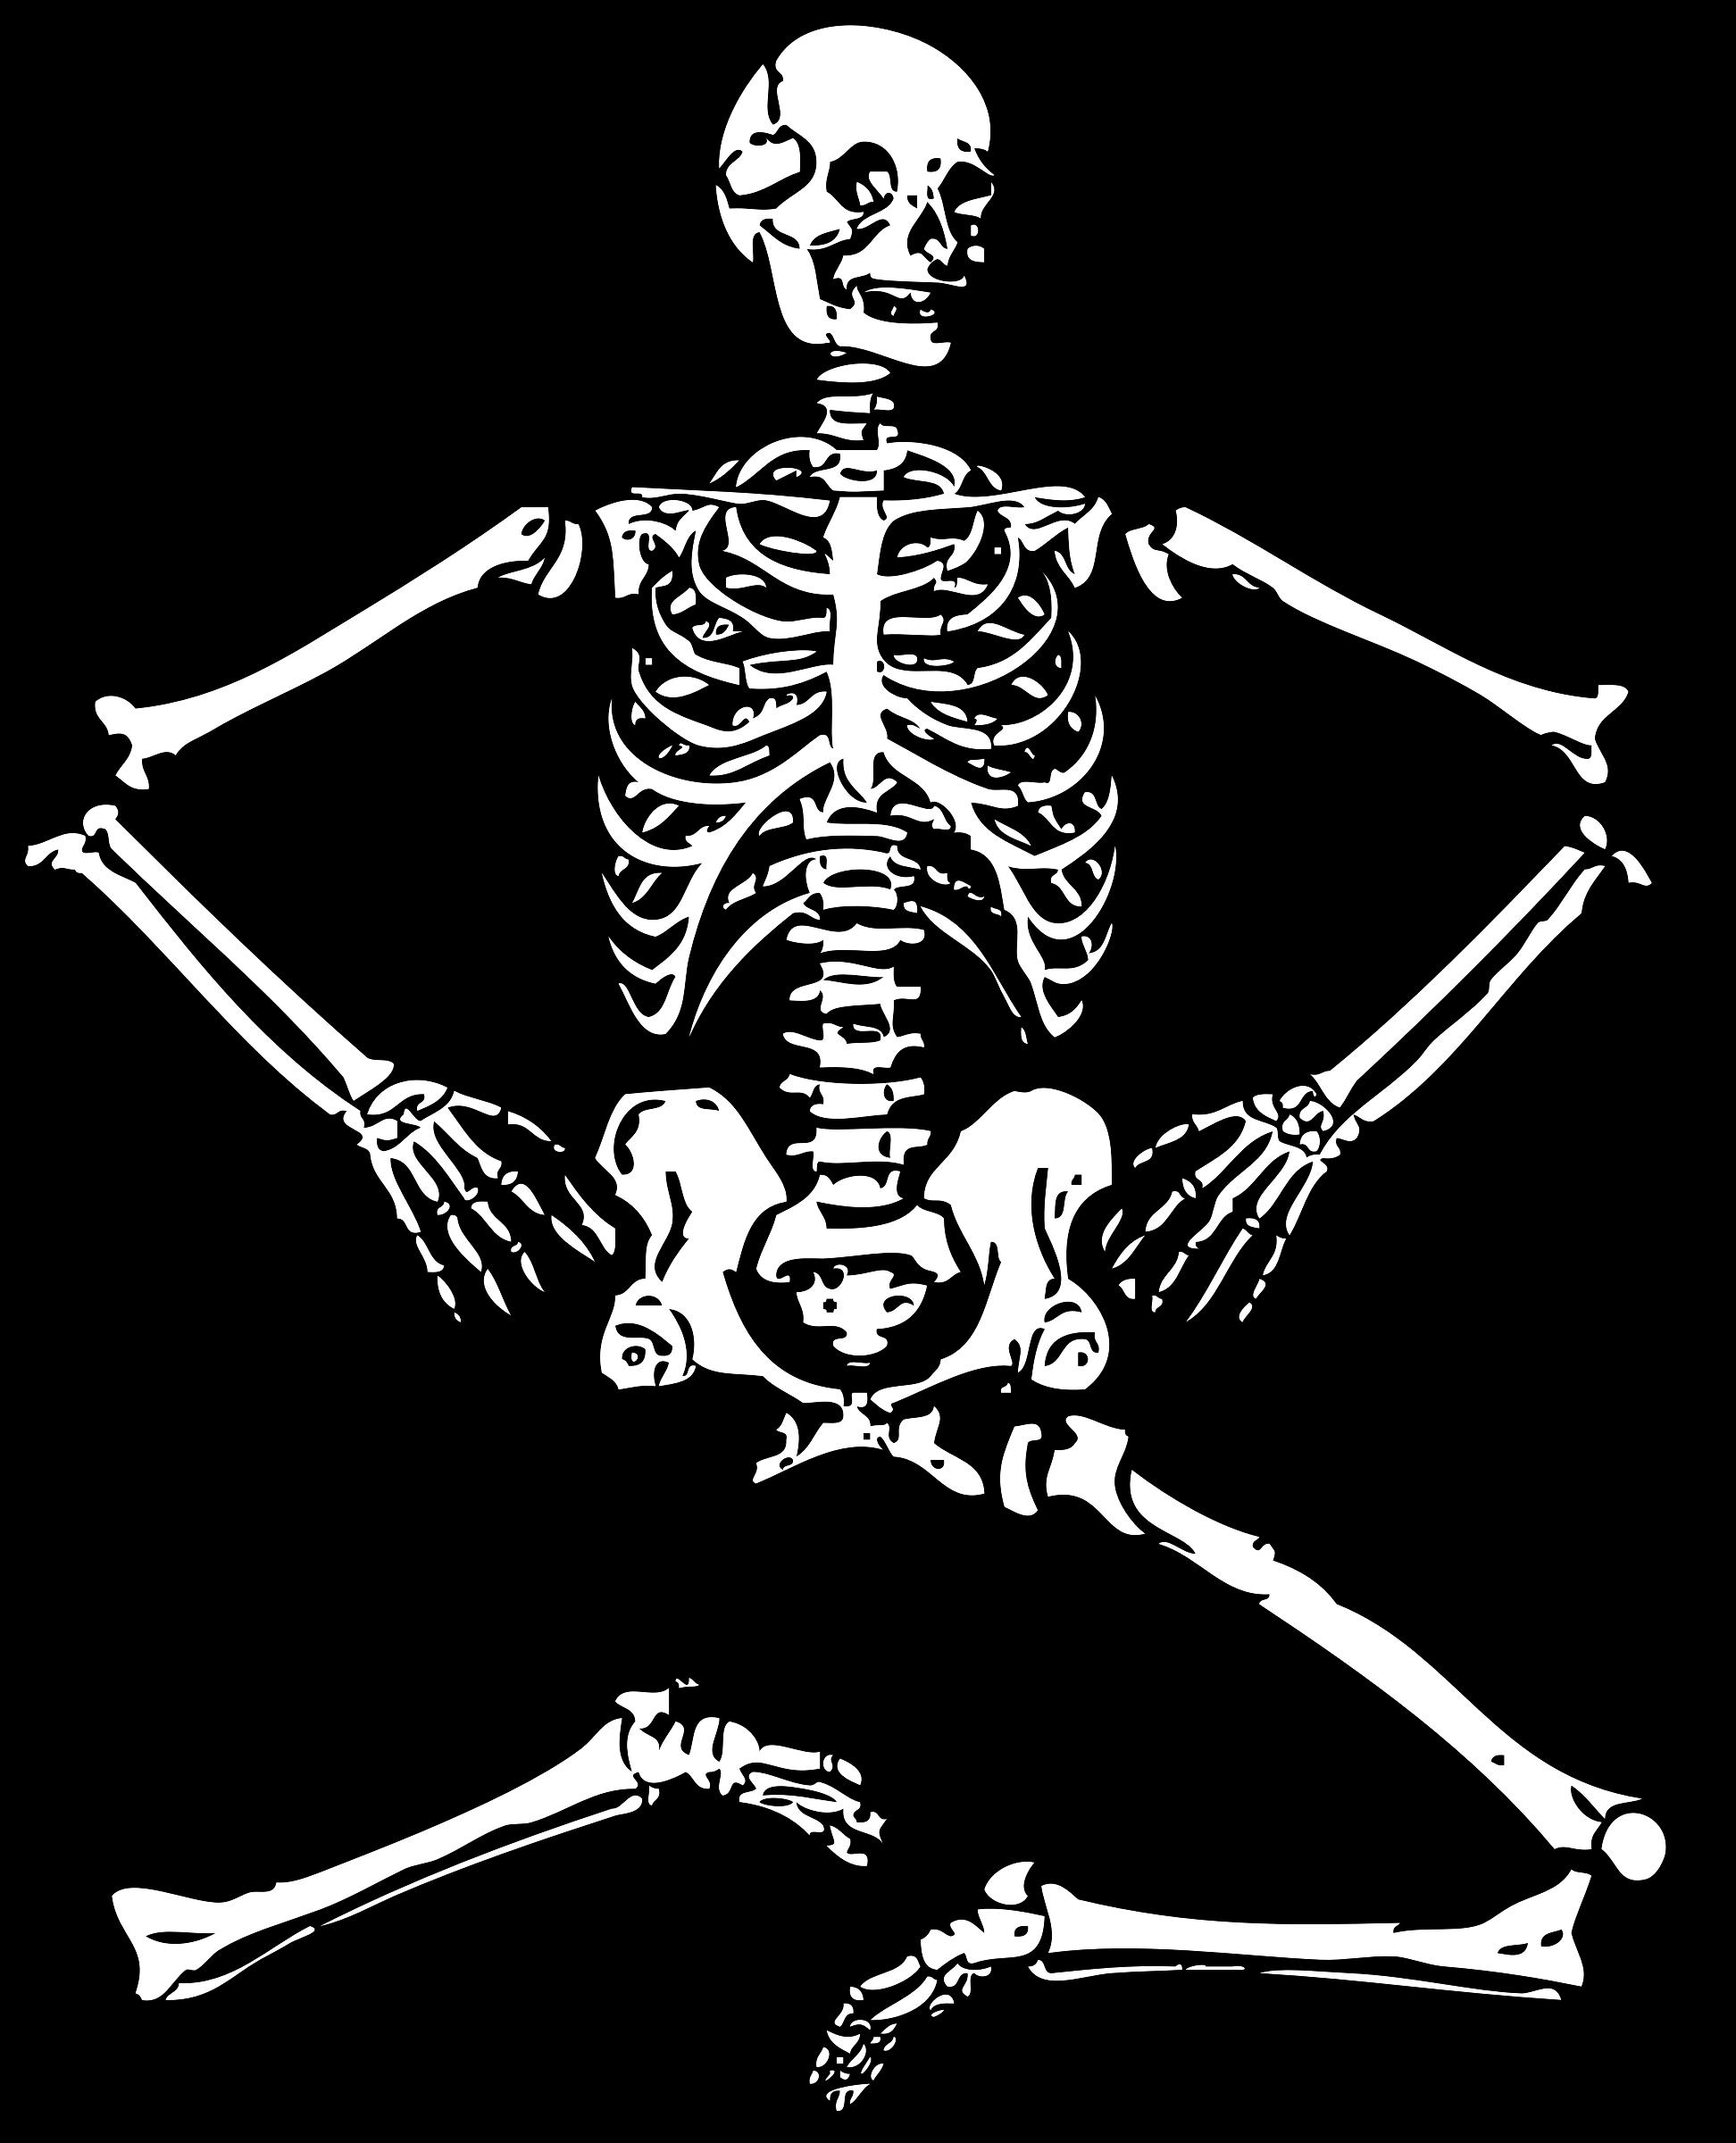 Skeleton clipart body part. Big image png